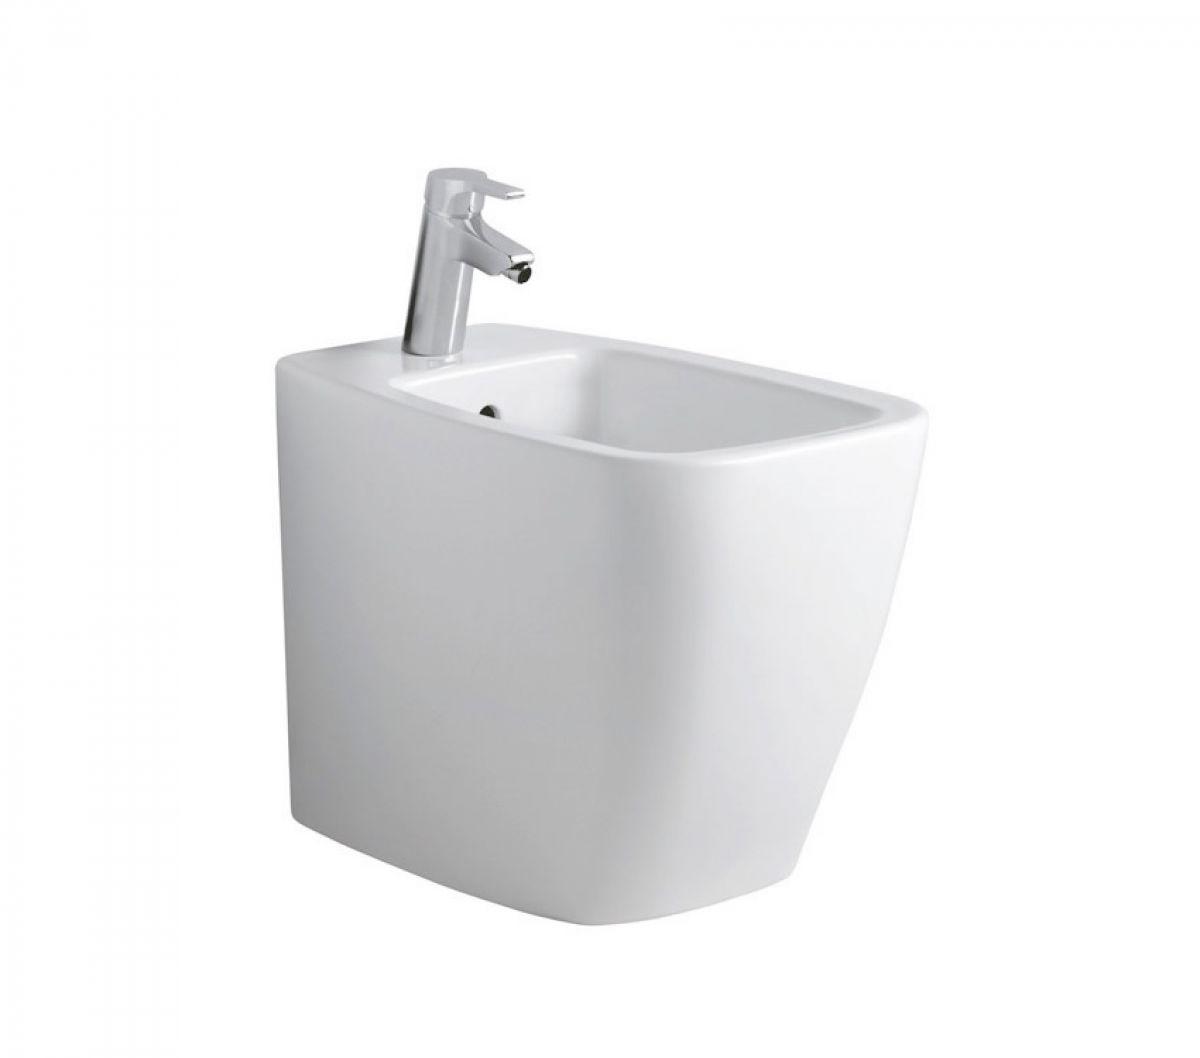 Ideal standard ventuno freestanding bidet uk bathrooms for Bidet ideal standard